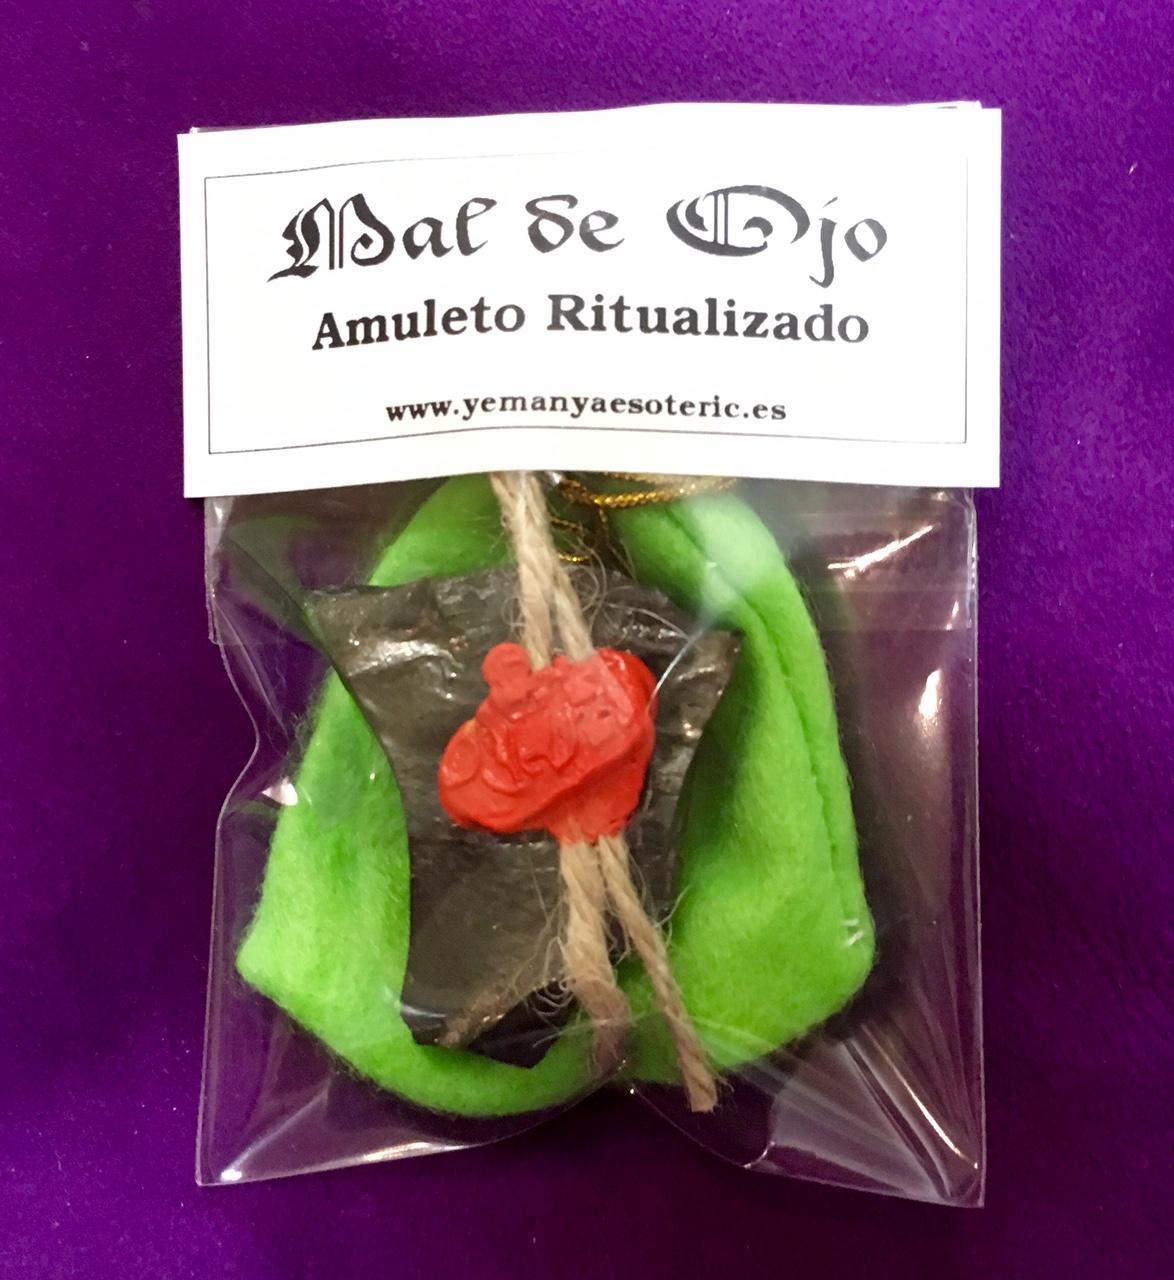 AMULETO RITUALIZADO MAL DE OJO